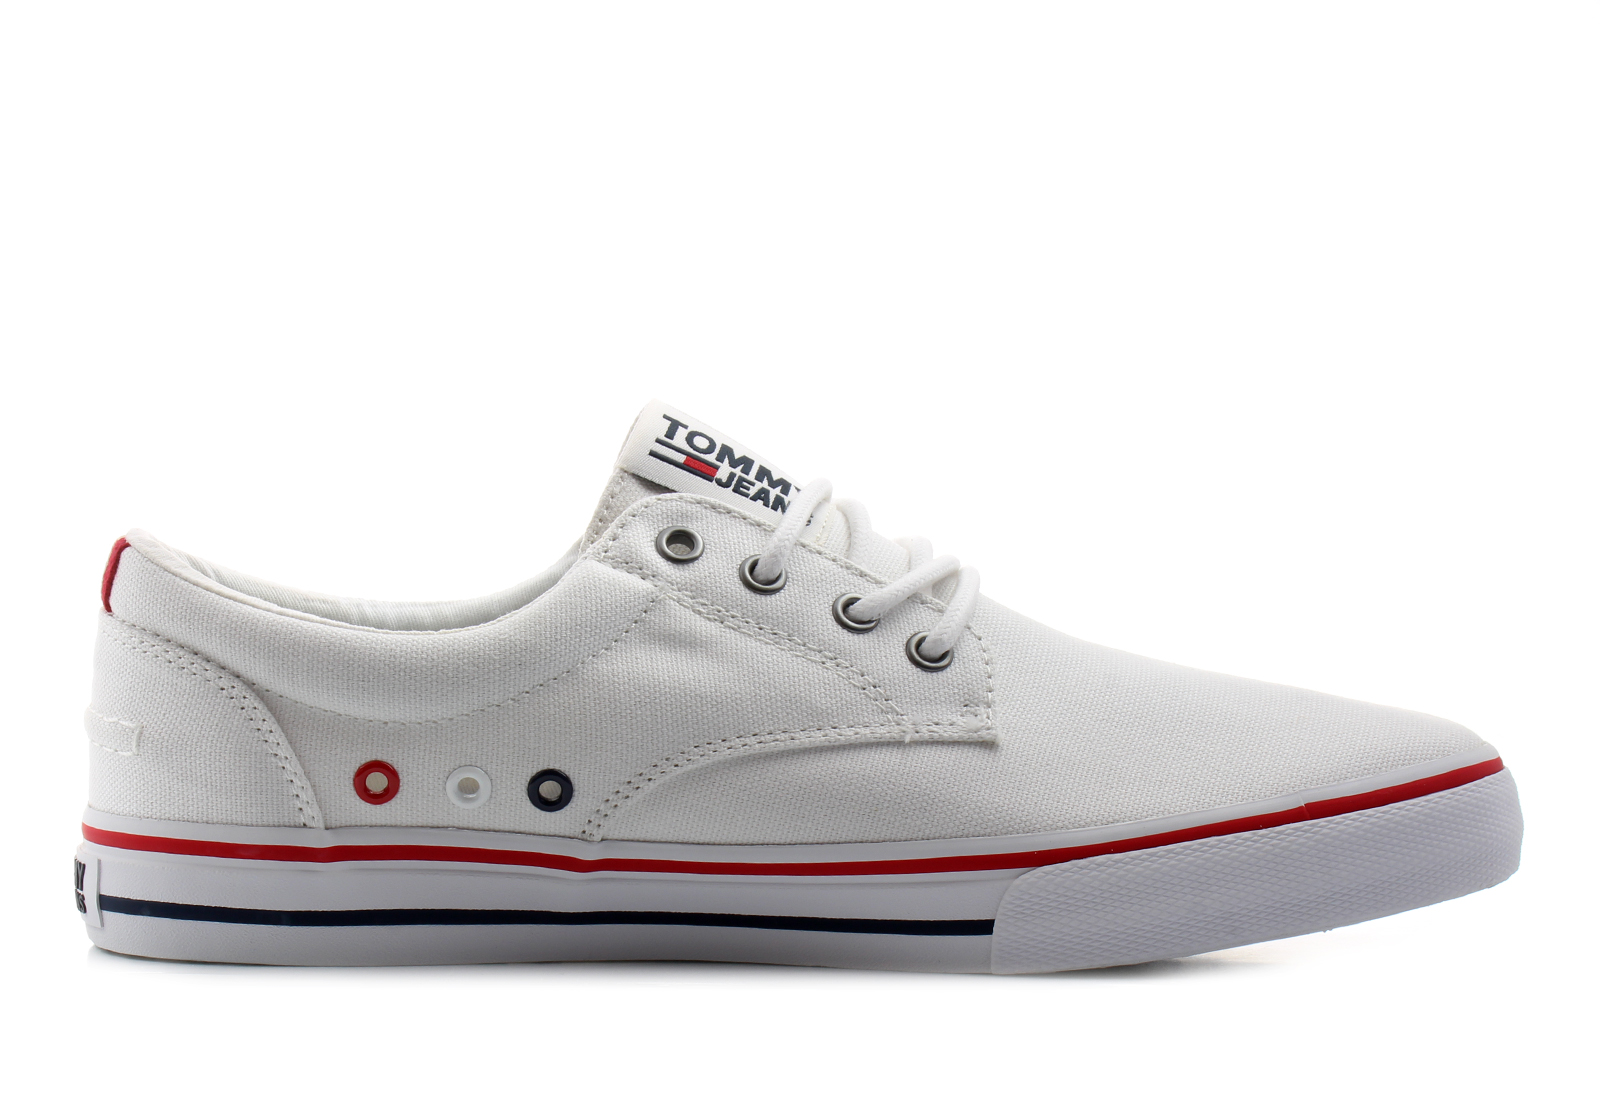 Tommy Hilfiger Shoes Vic 1d2 18s 0001 100 Online